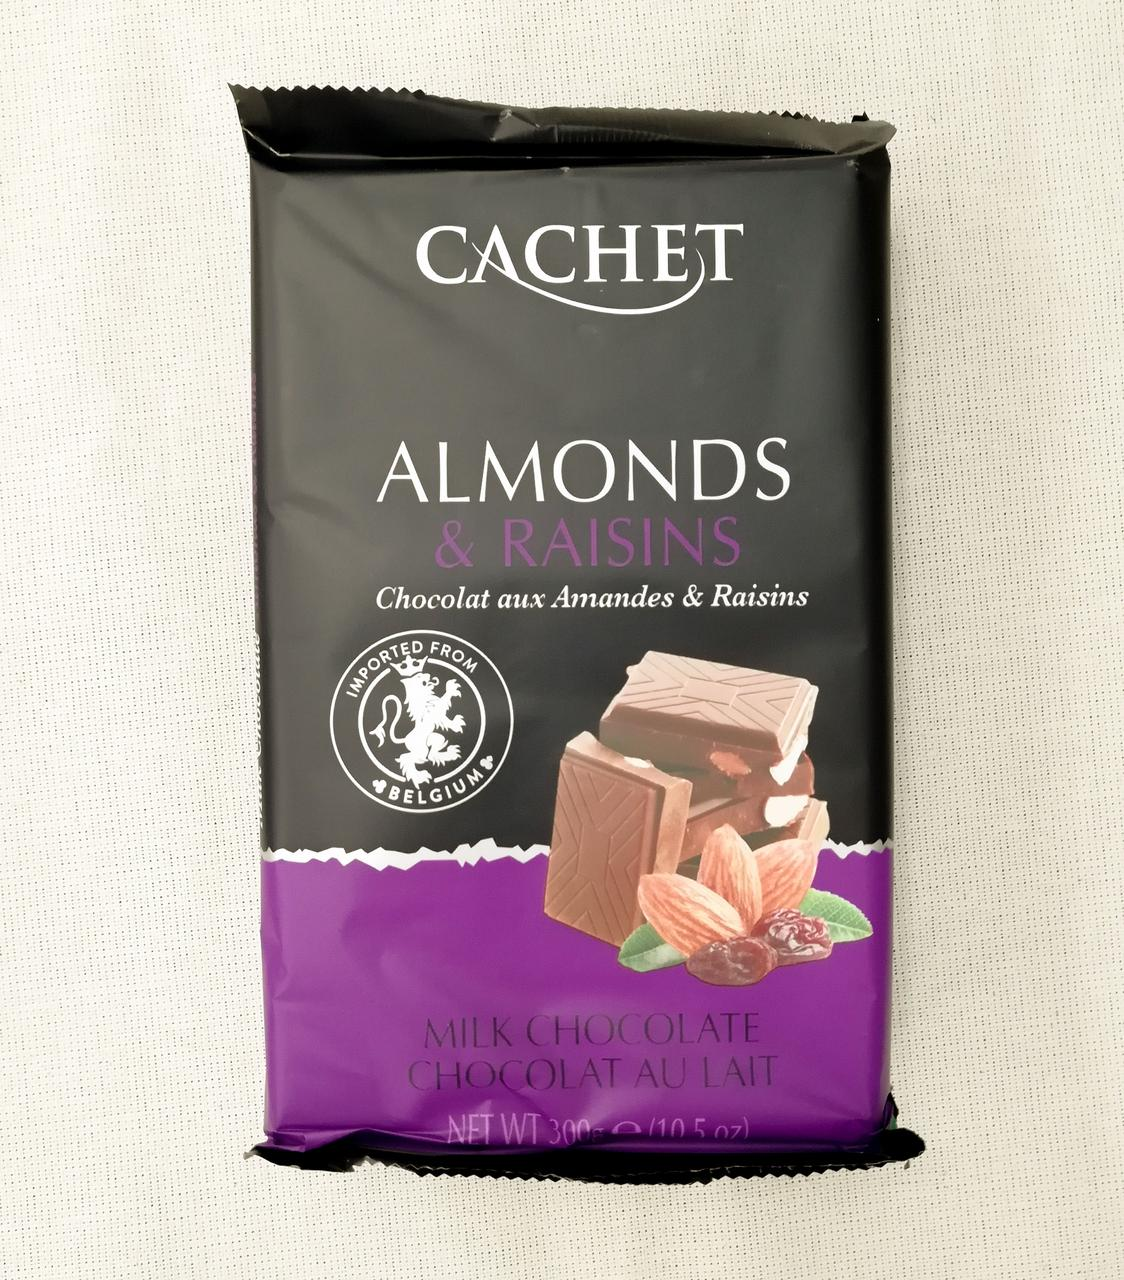 Cachet Almonds & Raisins 300 gramm